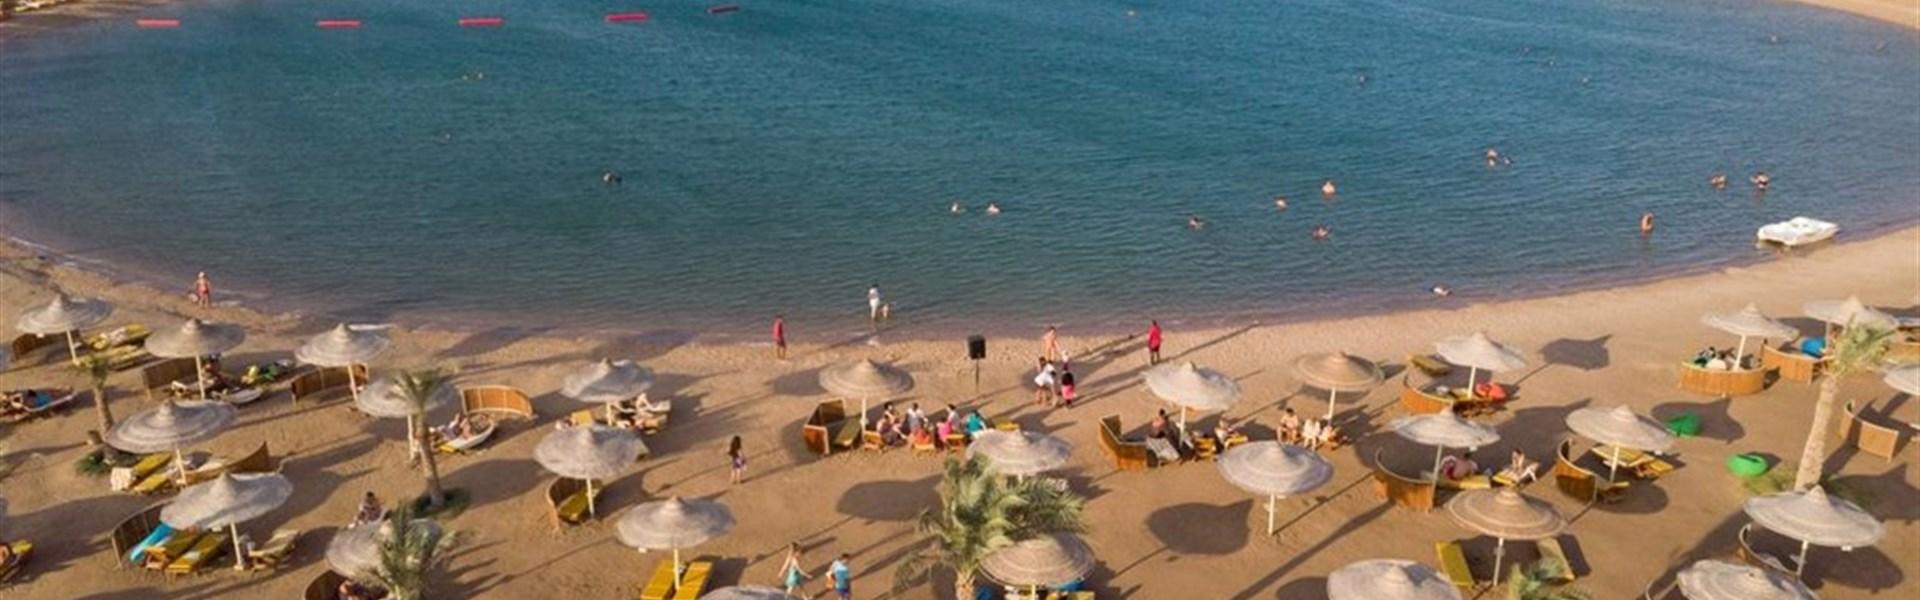 Marco Polo - Desert Rose Hurgada Resort 4* -